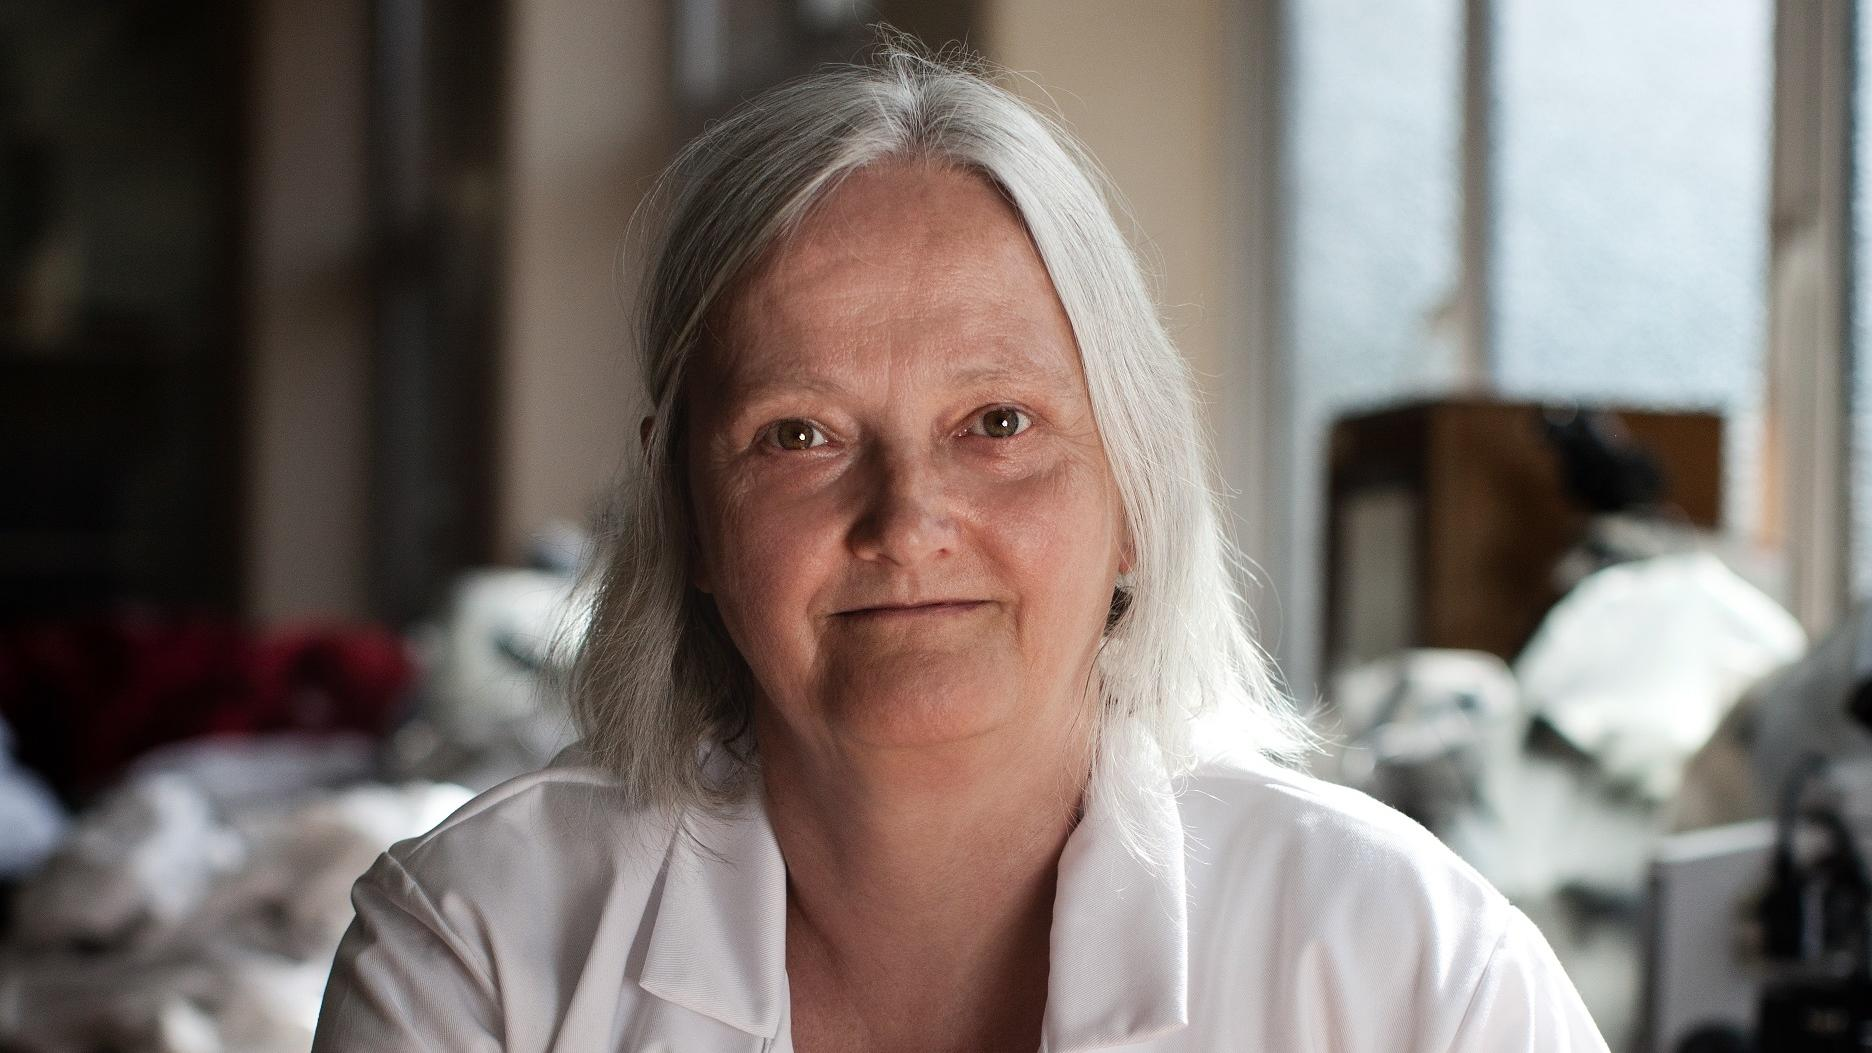 Professor Janet Hemingway